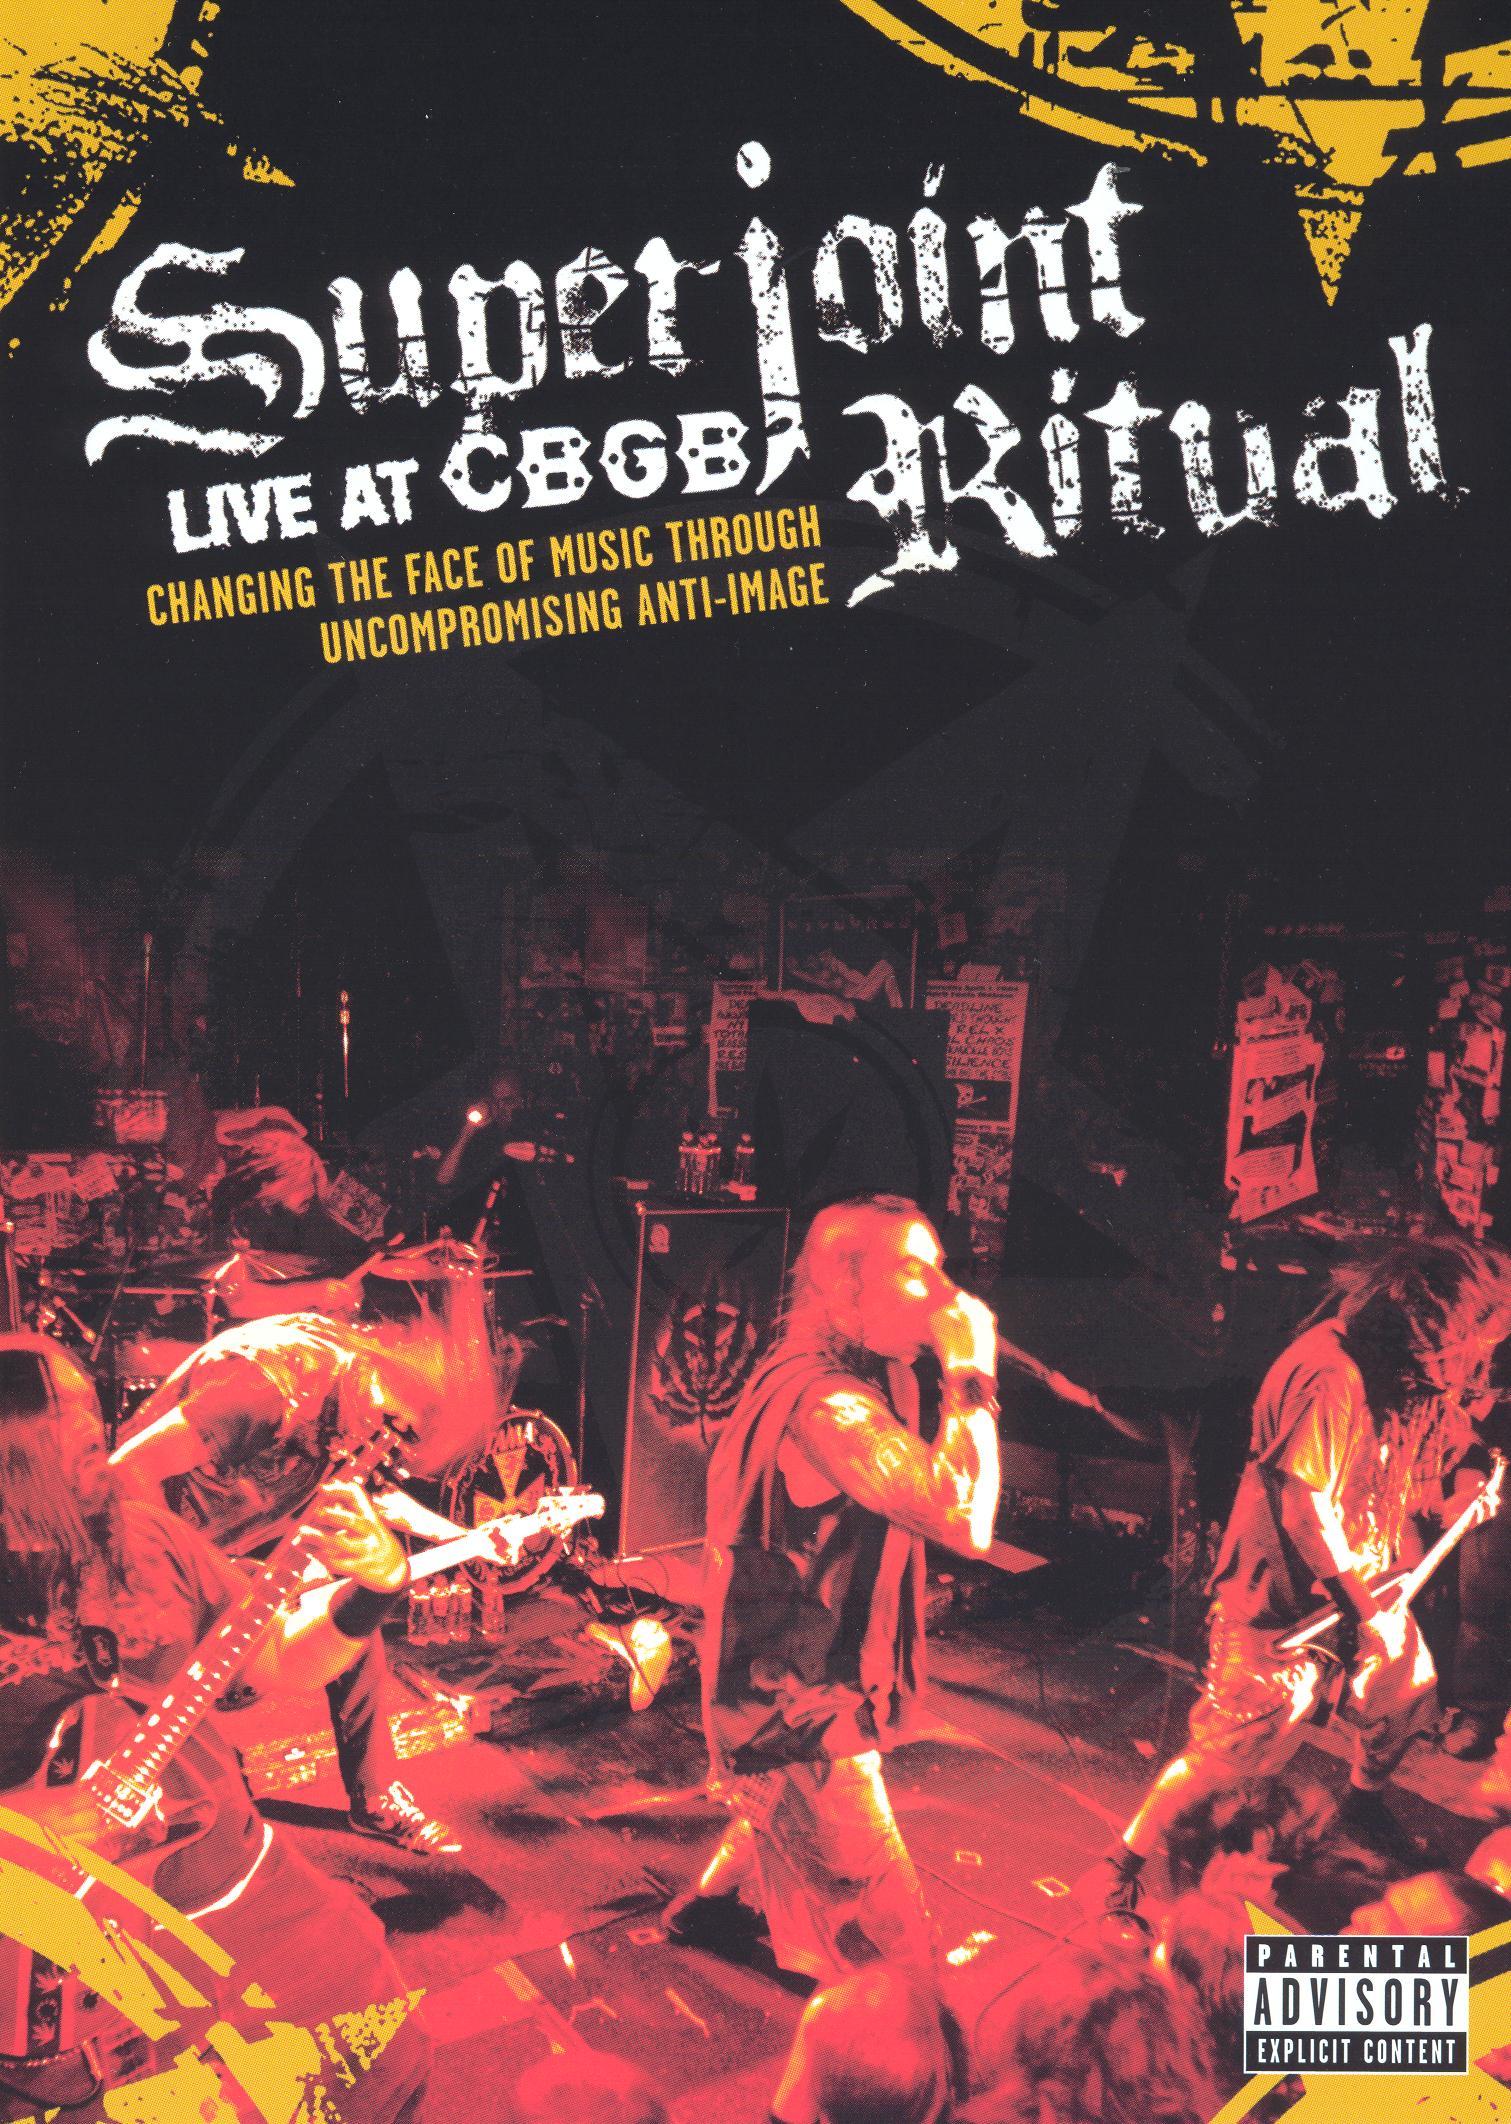 Superjoint Ritual: Live at CBGB 2004